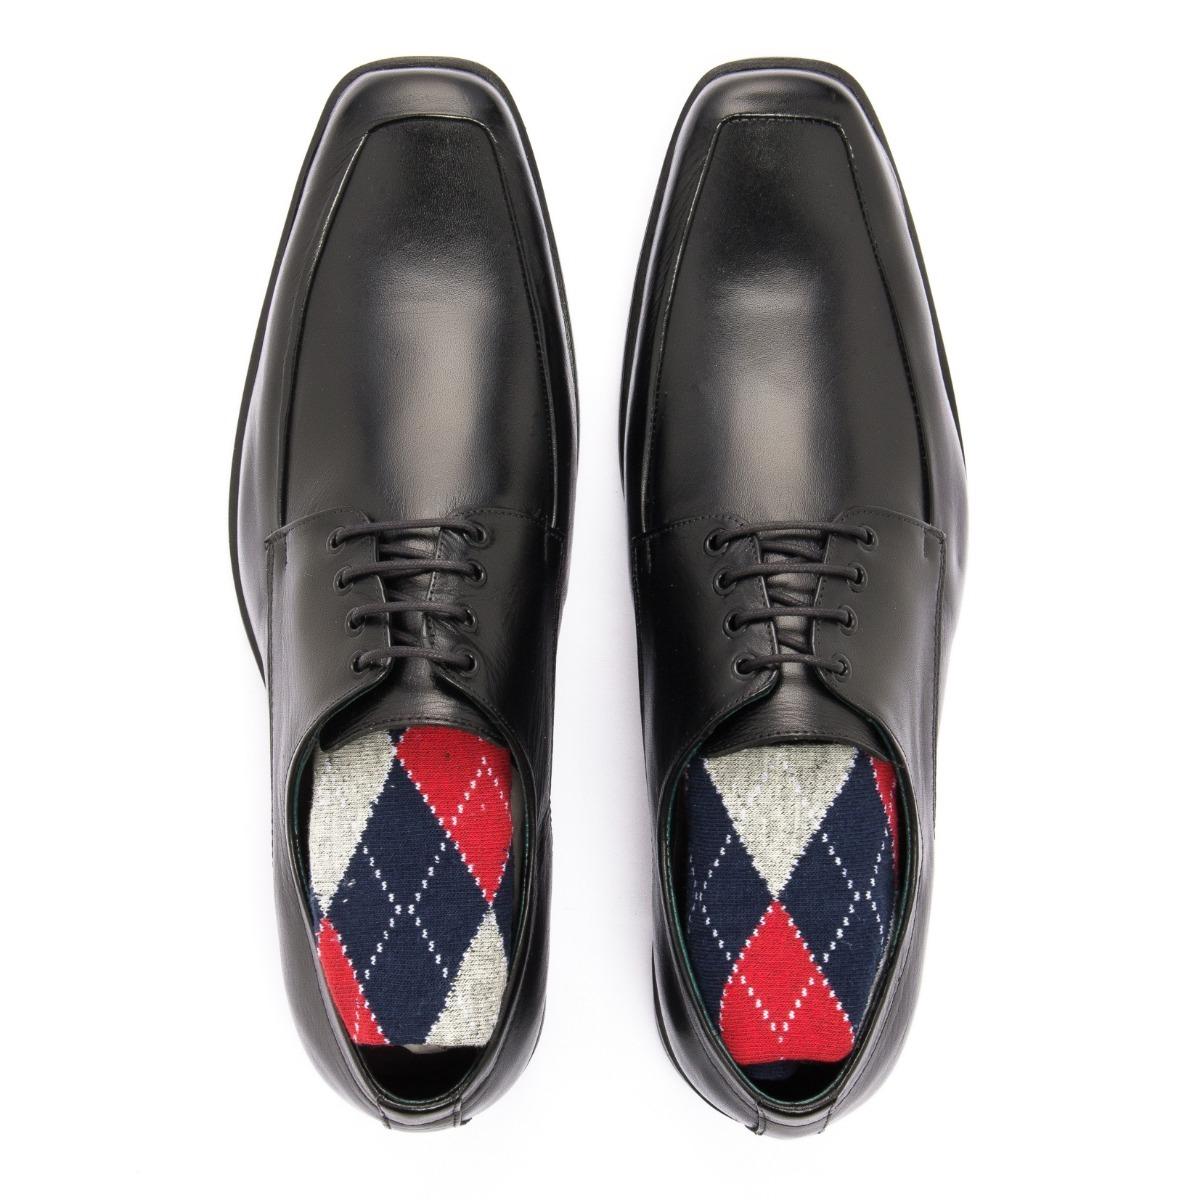 eea287f8a6 sapato social masculino 100% couro legítimo estilo italiano. Carregando  zoom.